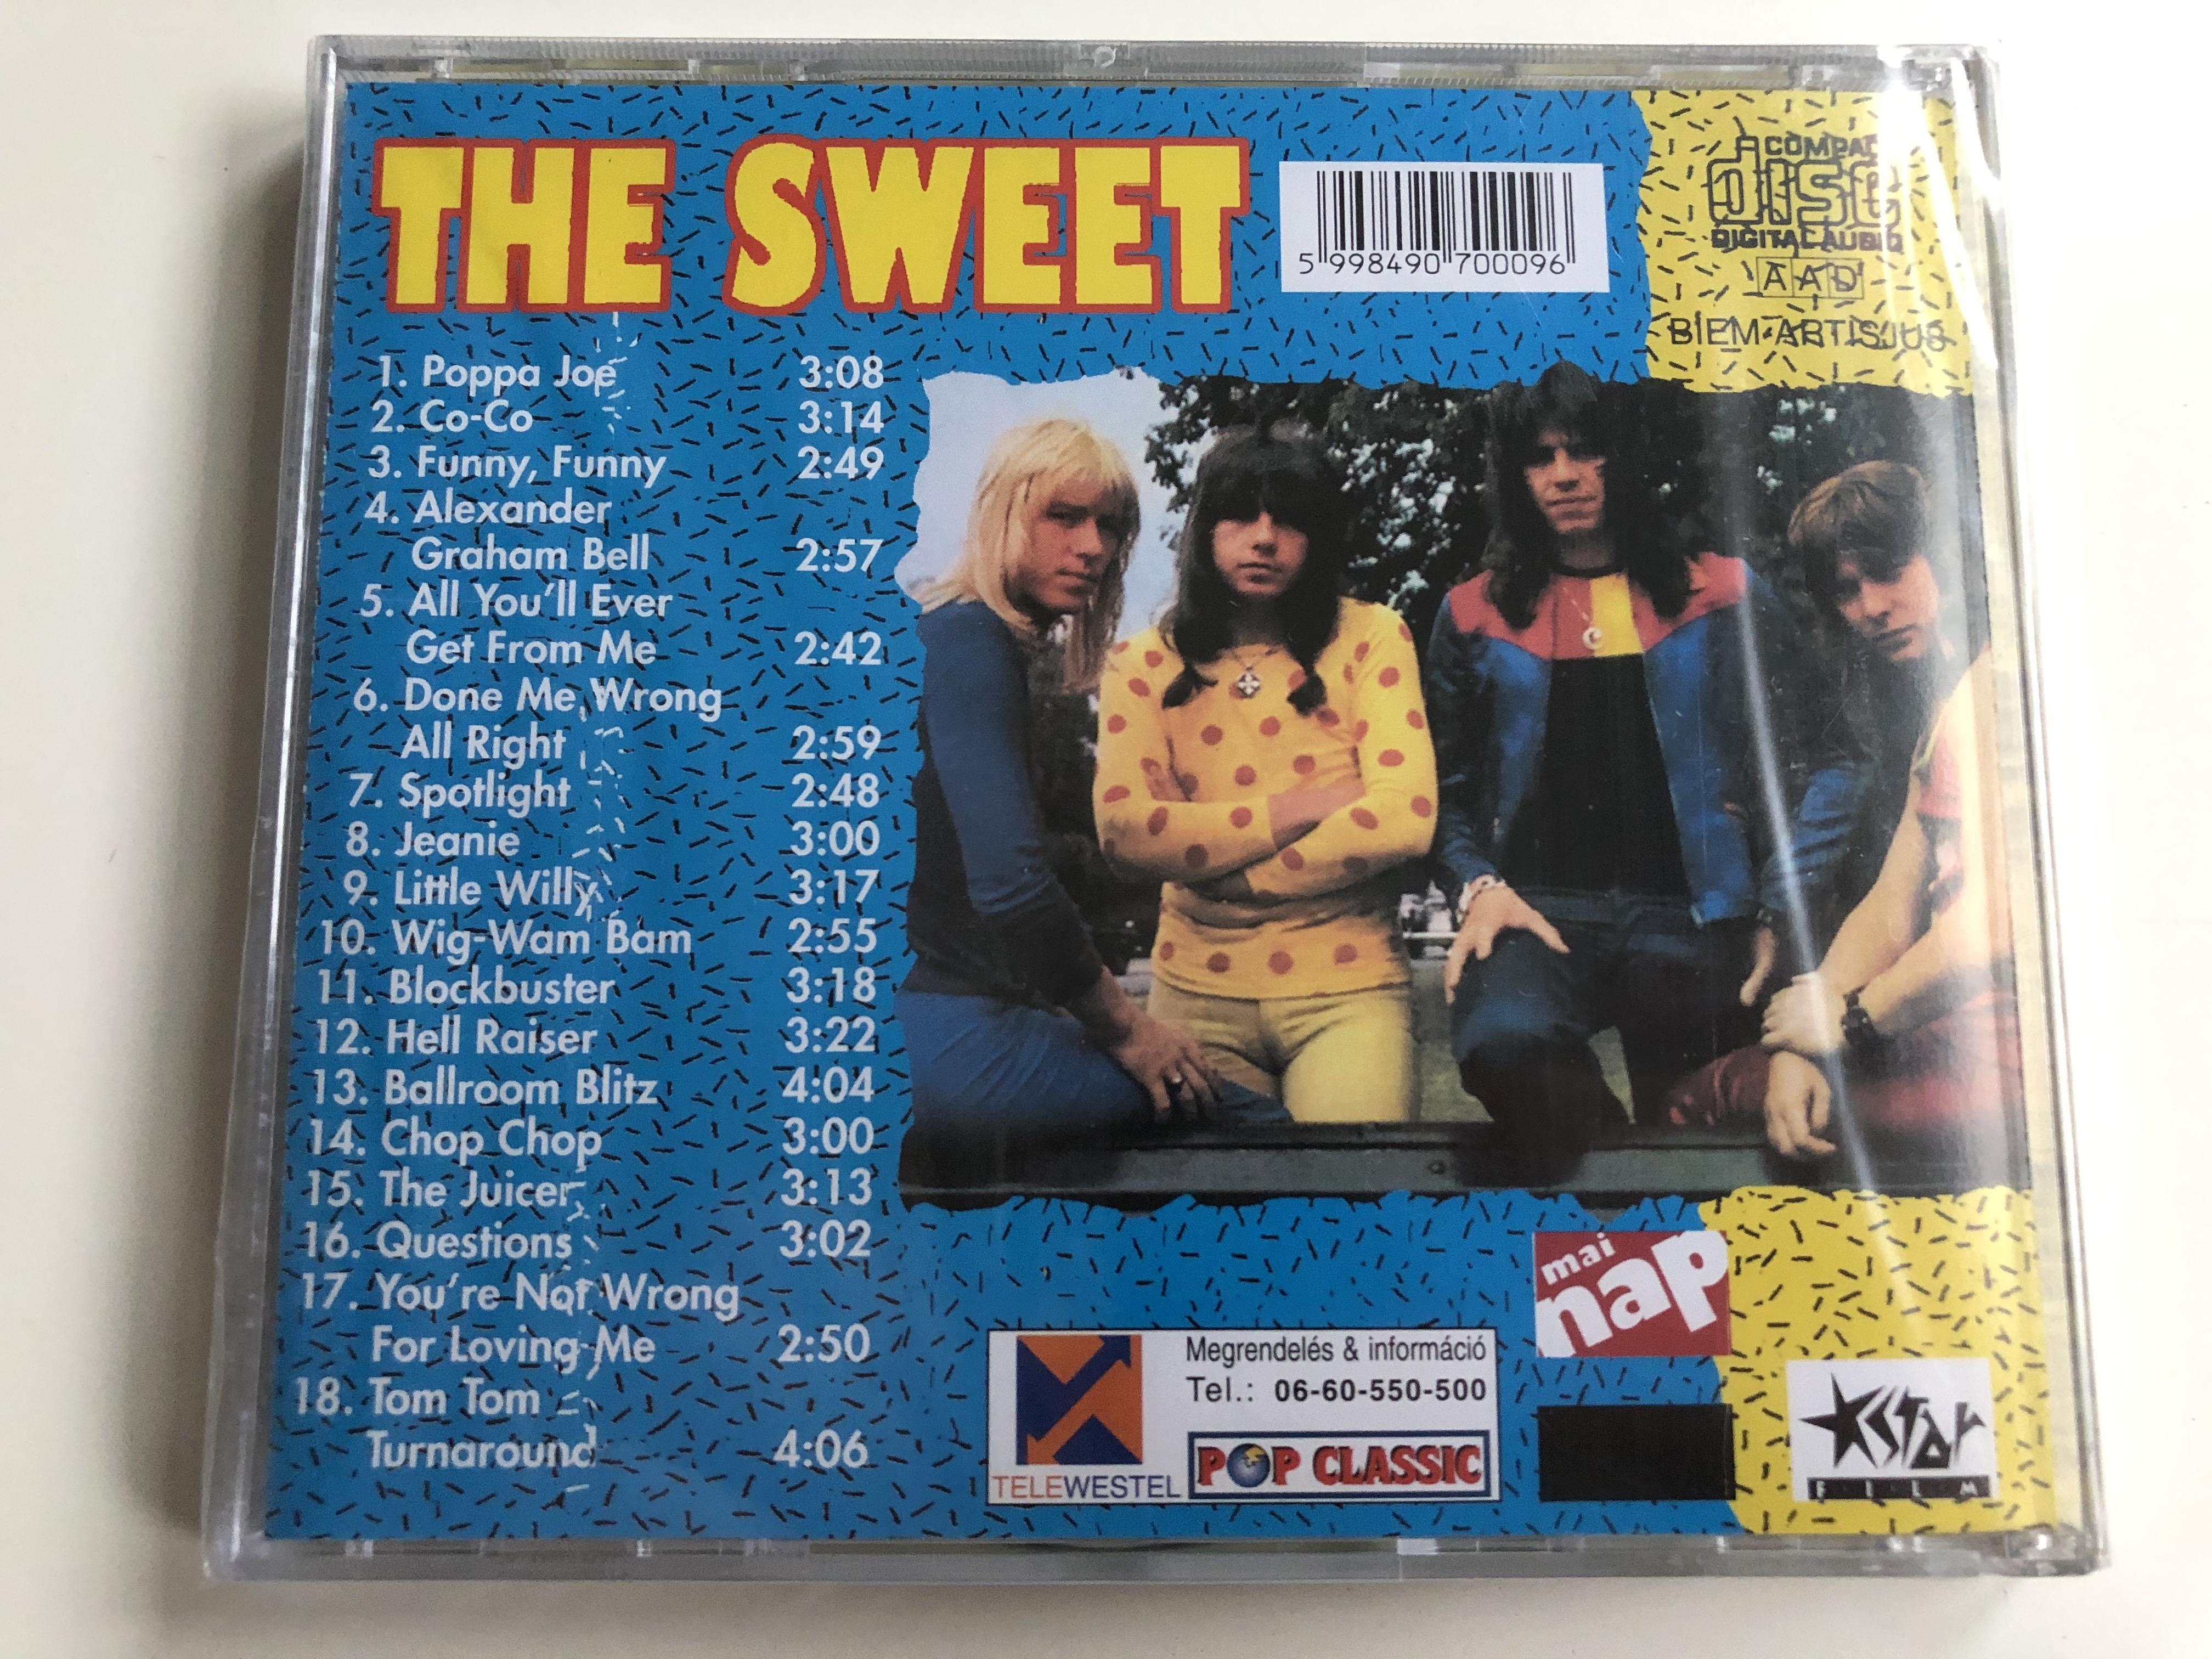 the-sweet-best-of-the-sweet-wig-wam-bam-co-co-poppa-joe-ballroom-blitz-funny-funny-hell-raiser-pop-classic-euroton-audio-cd-eucd-0009-2-.jpg